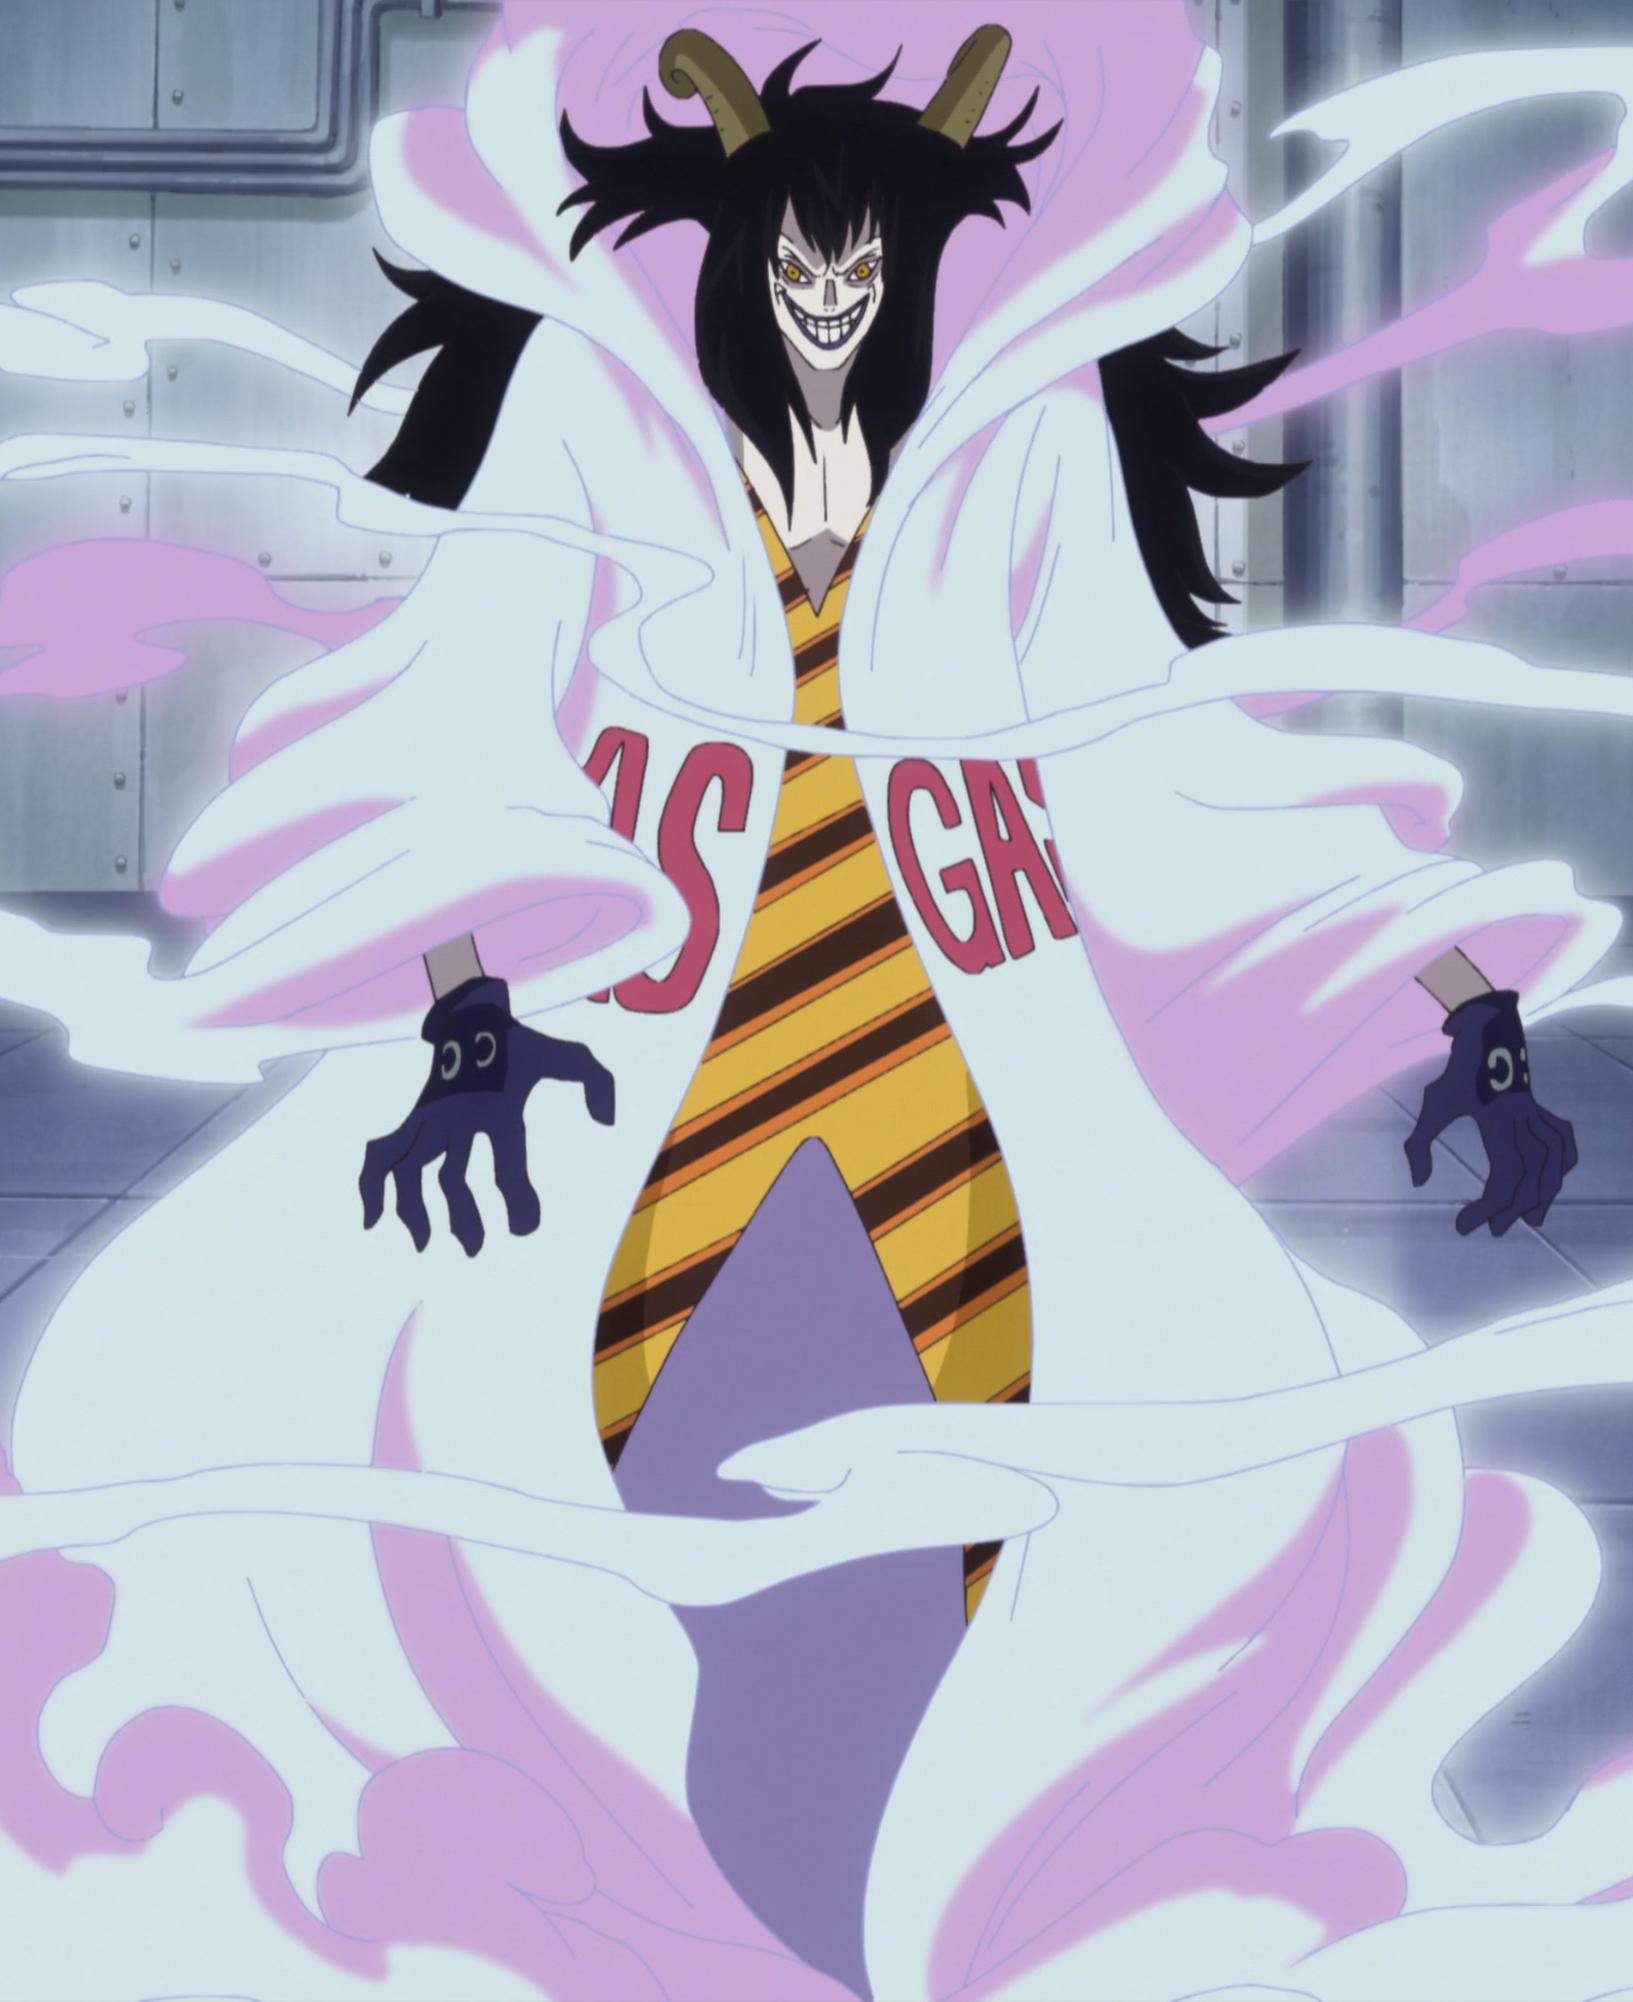 Image Result For Anime Wallpaper Imagesa